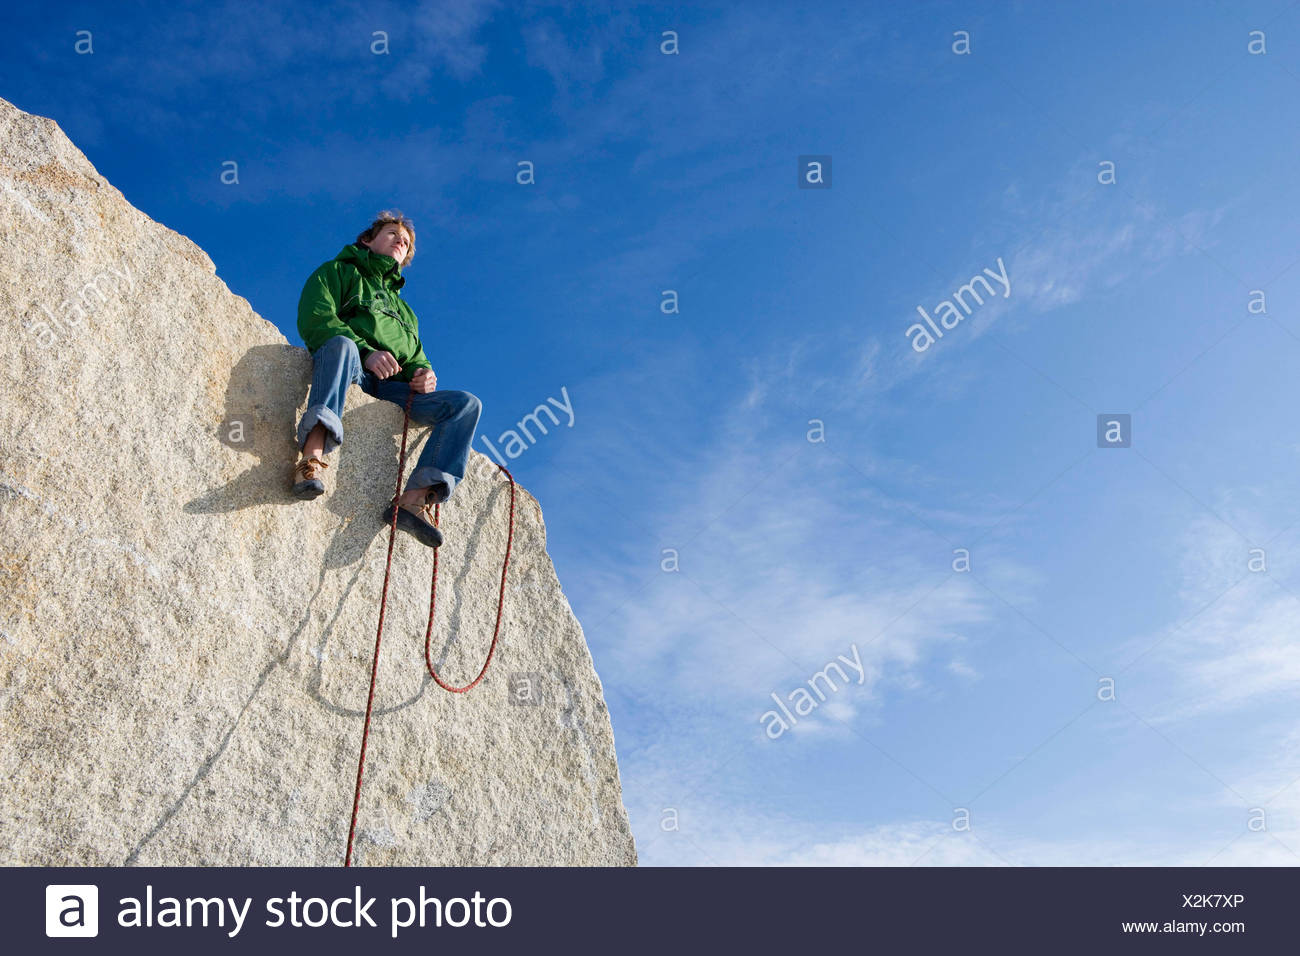 Climber sitting on peak - Stock Image